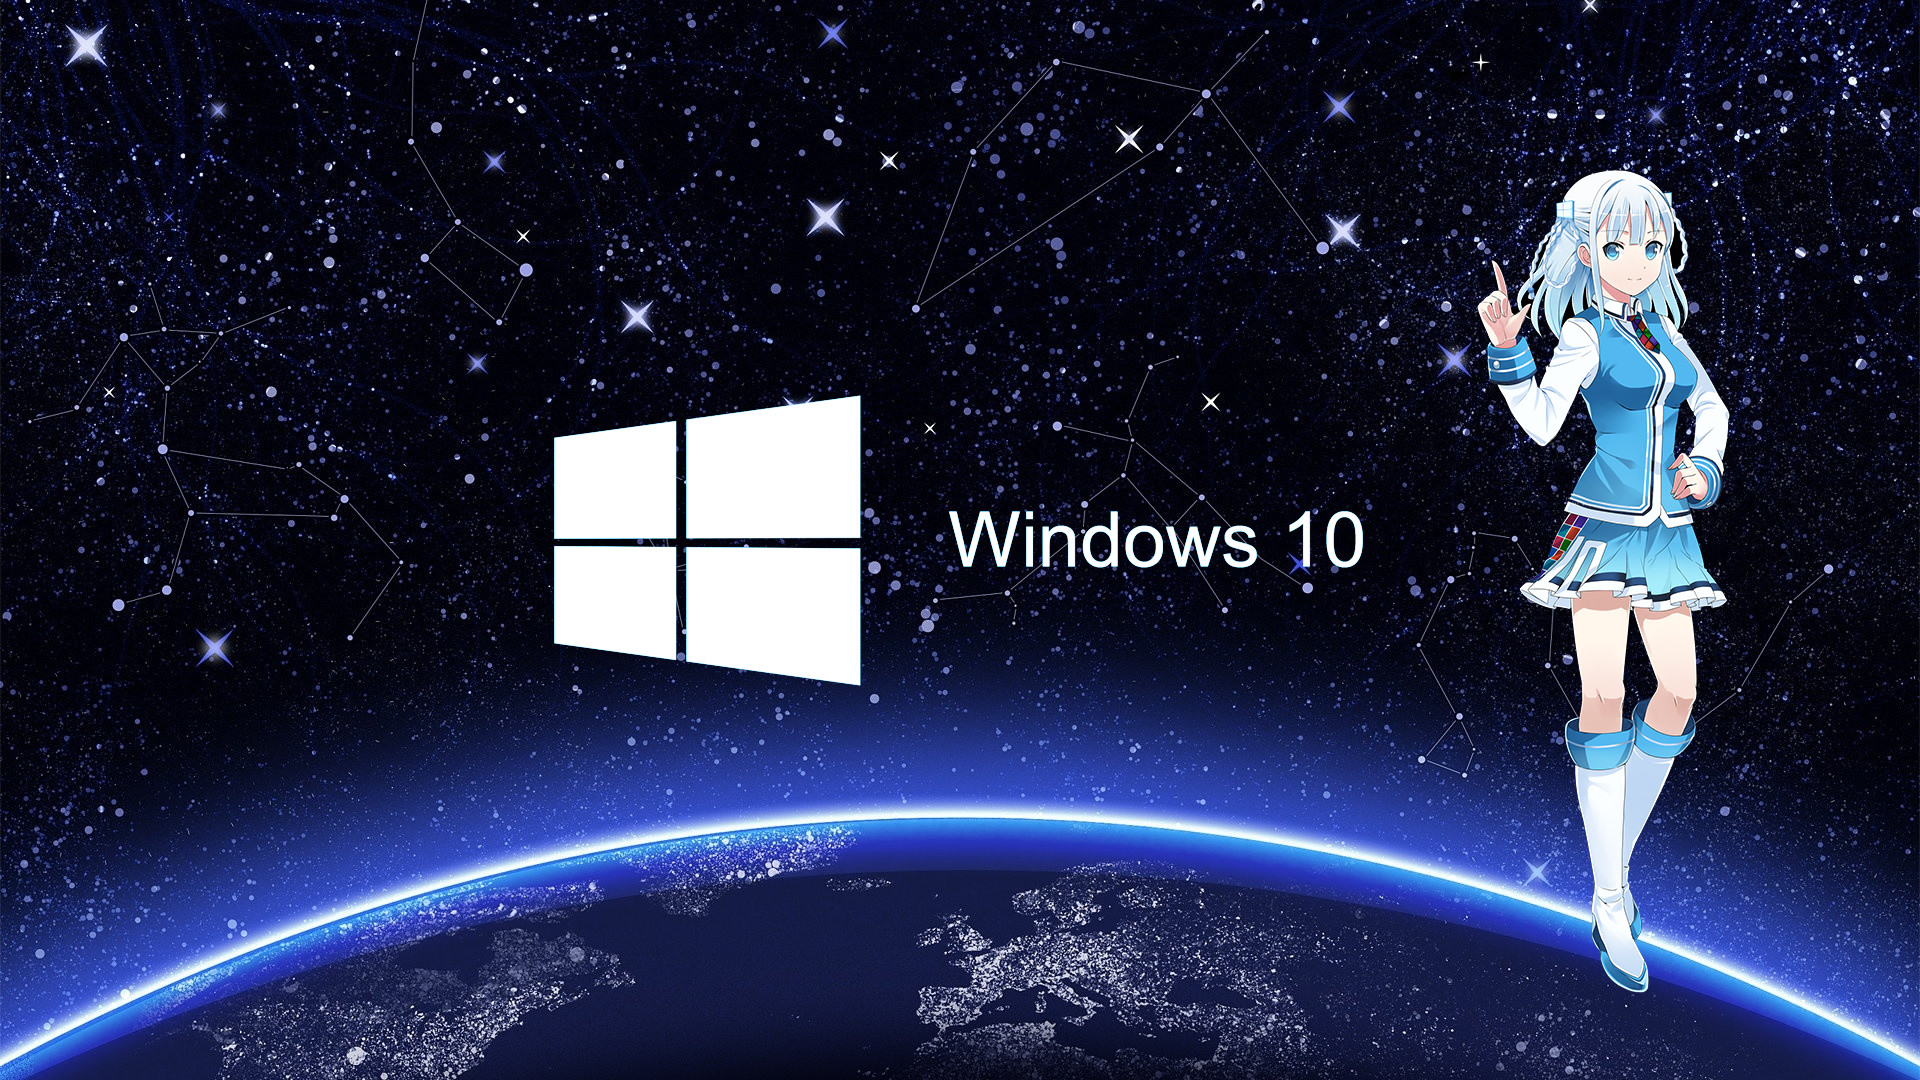 Lock Screen Windows 10 Full Hd Anime Wallpaper